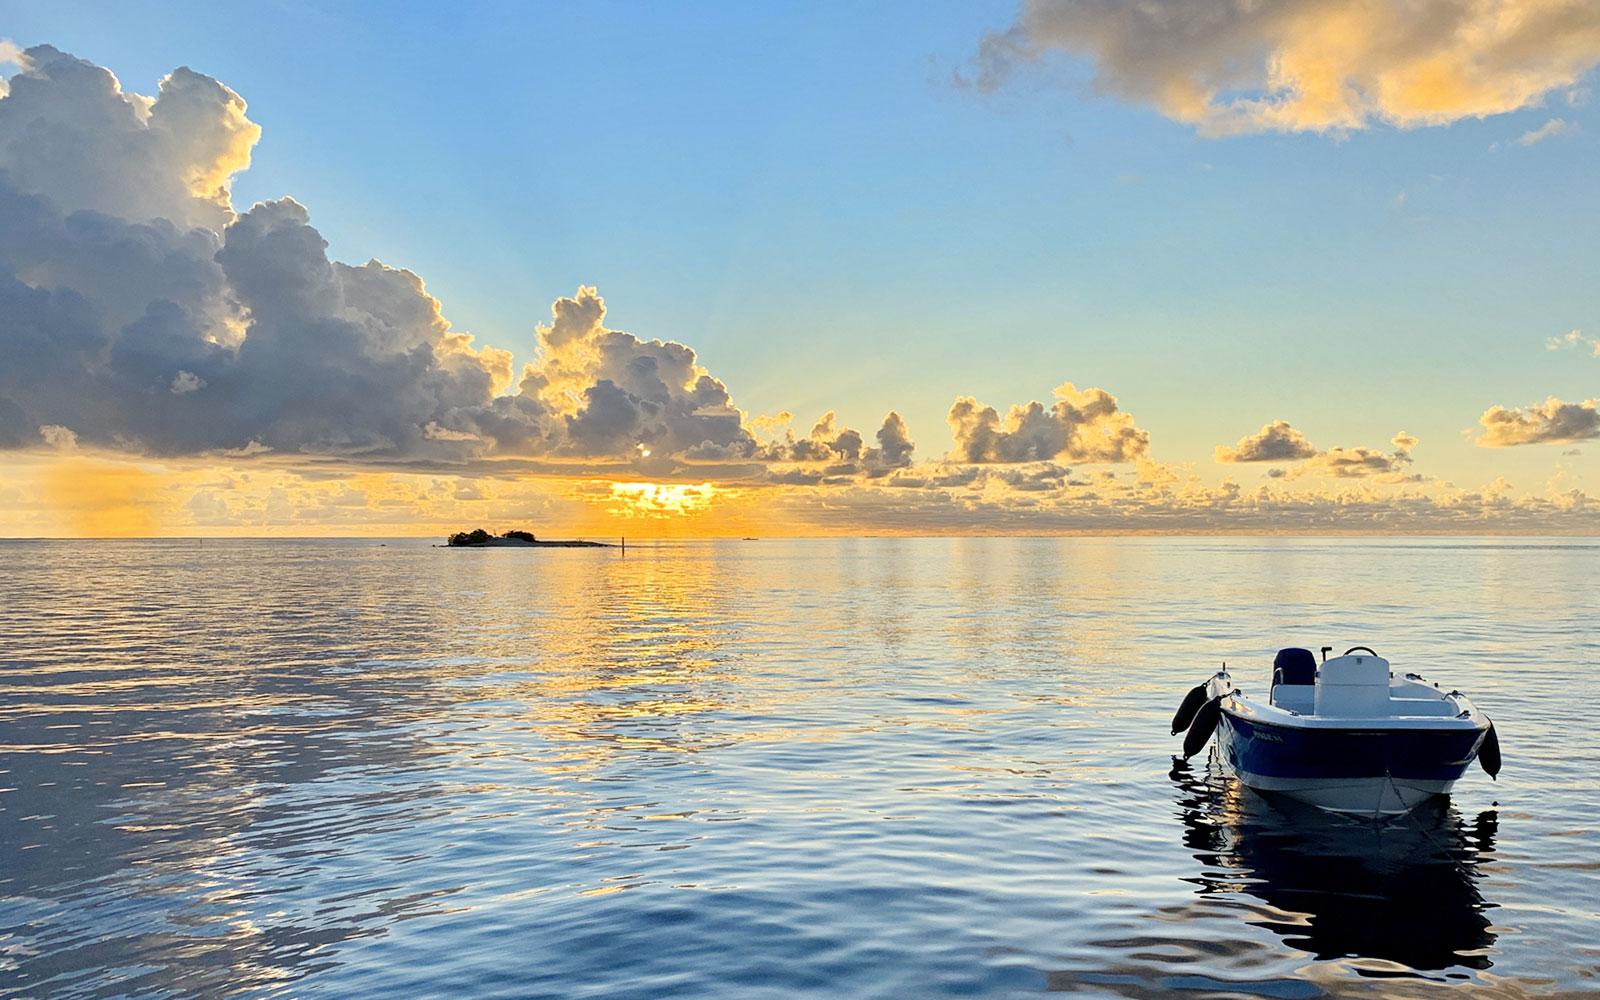 Maldive_271119_1454.jpg